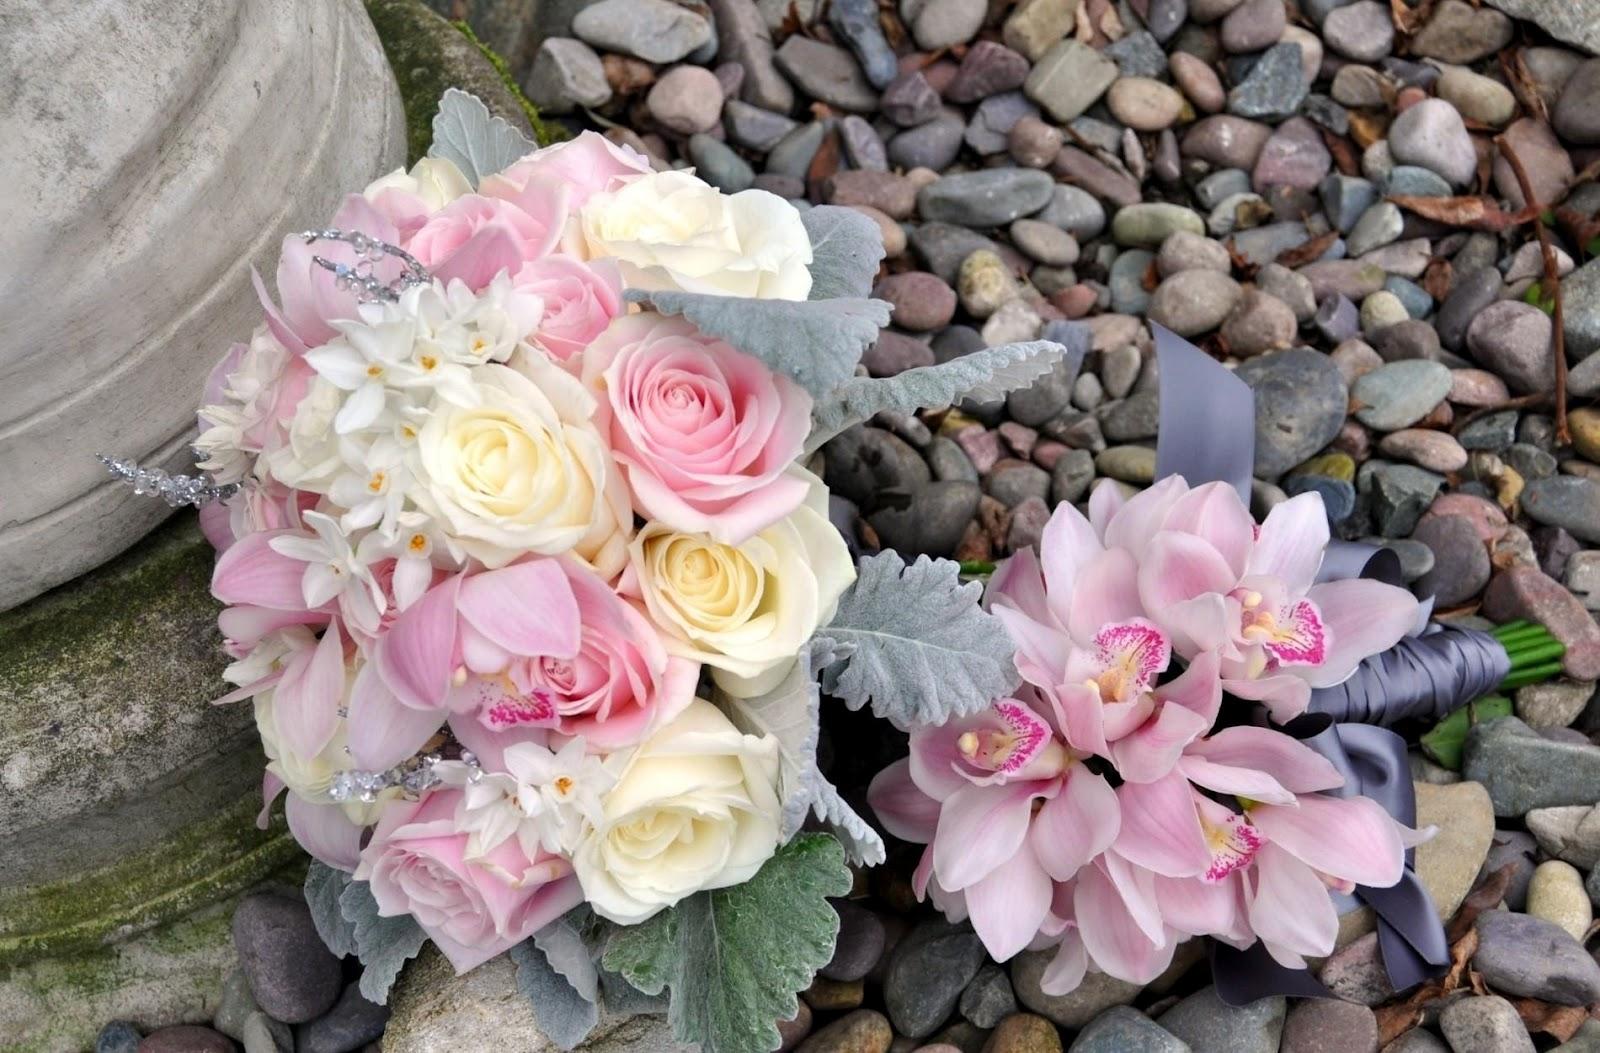 Beautiful Flowers Bouquet Images: Beautiful Flower Wallpapers For You: Flowers Bouquet Wallpaper